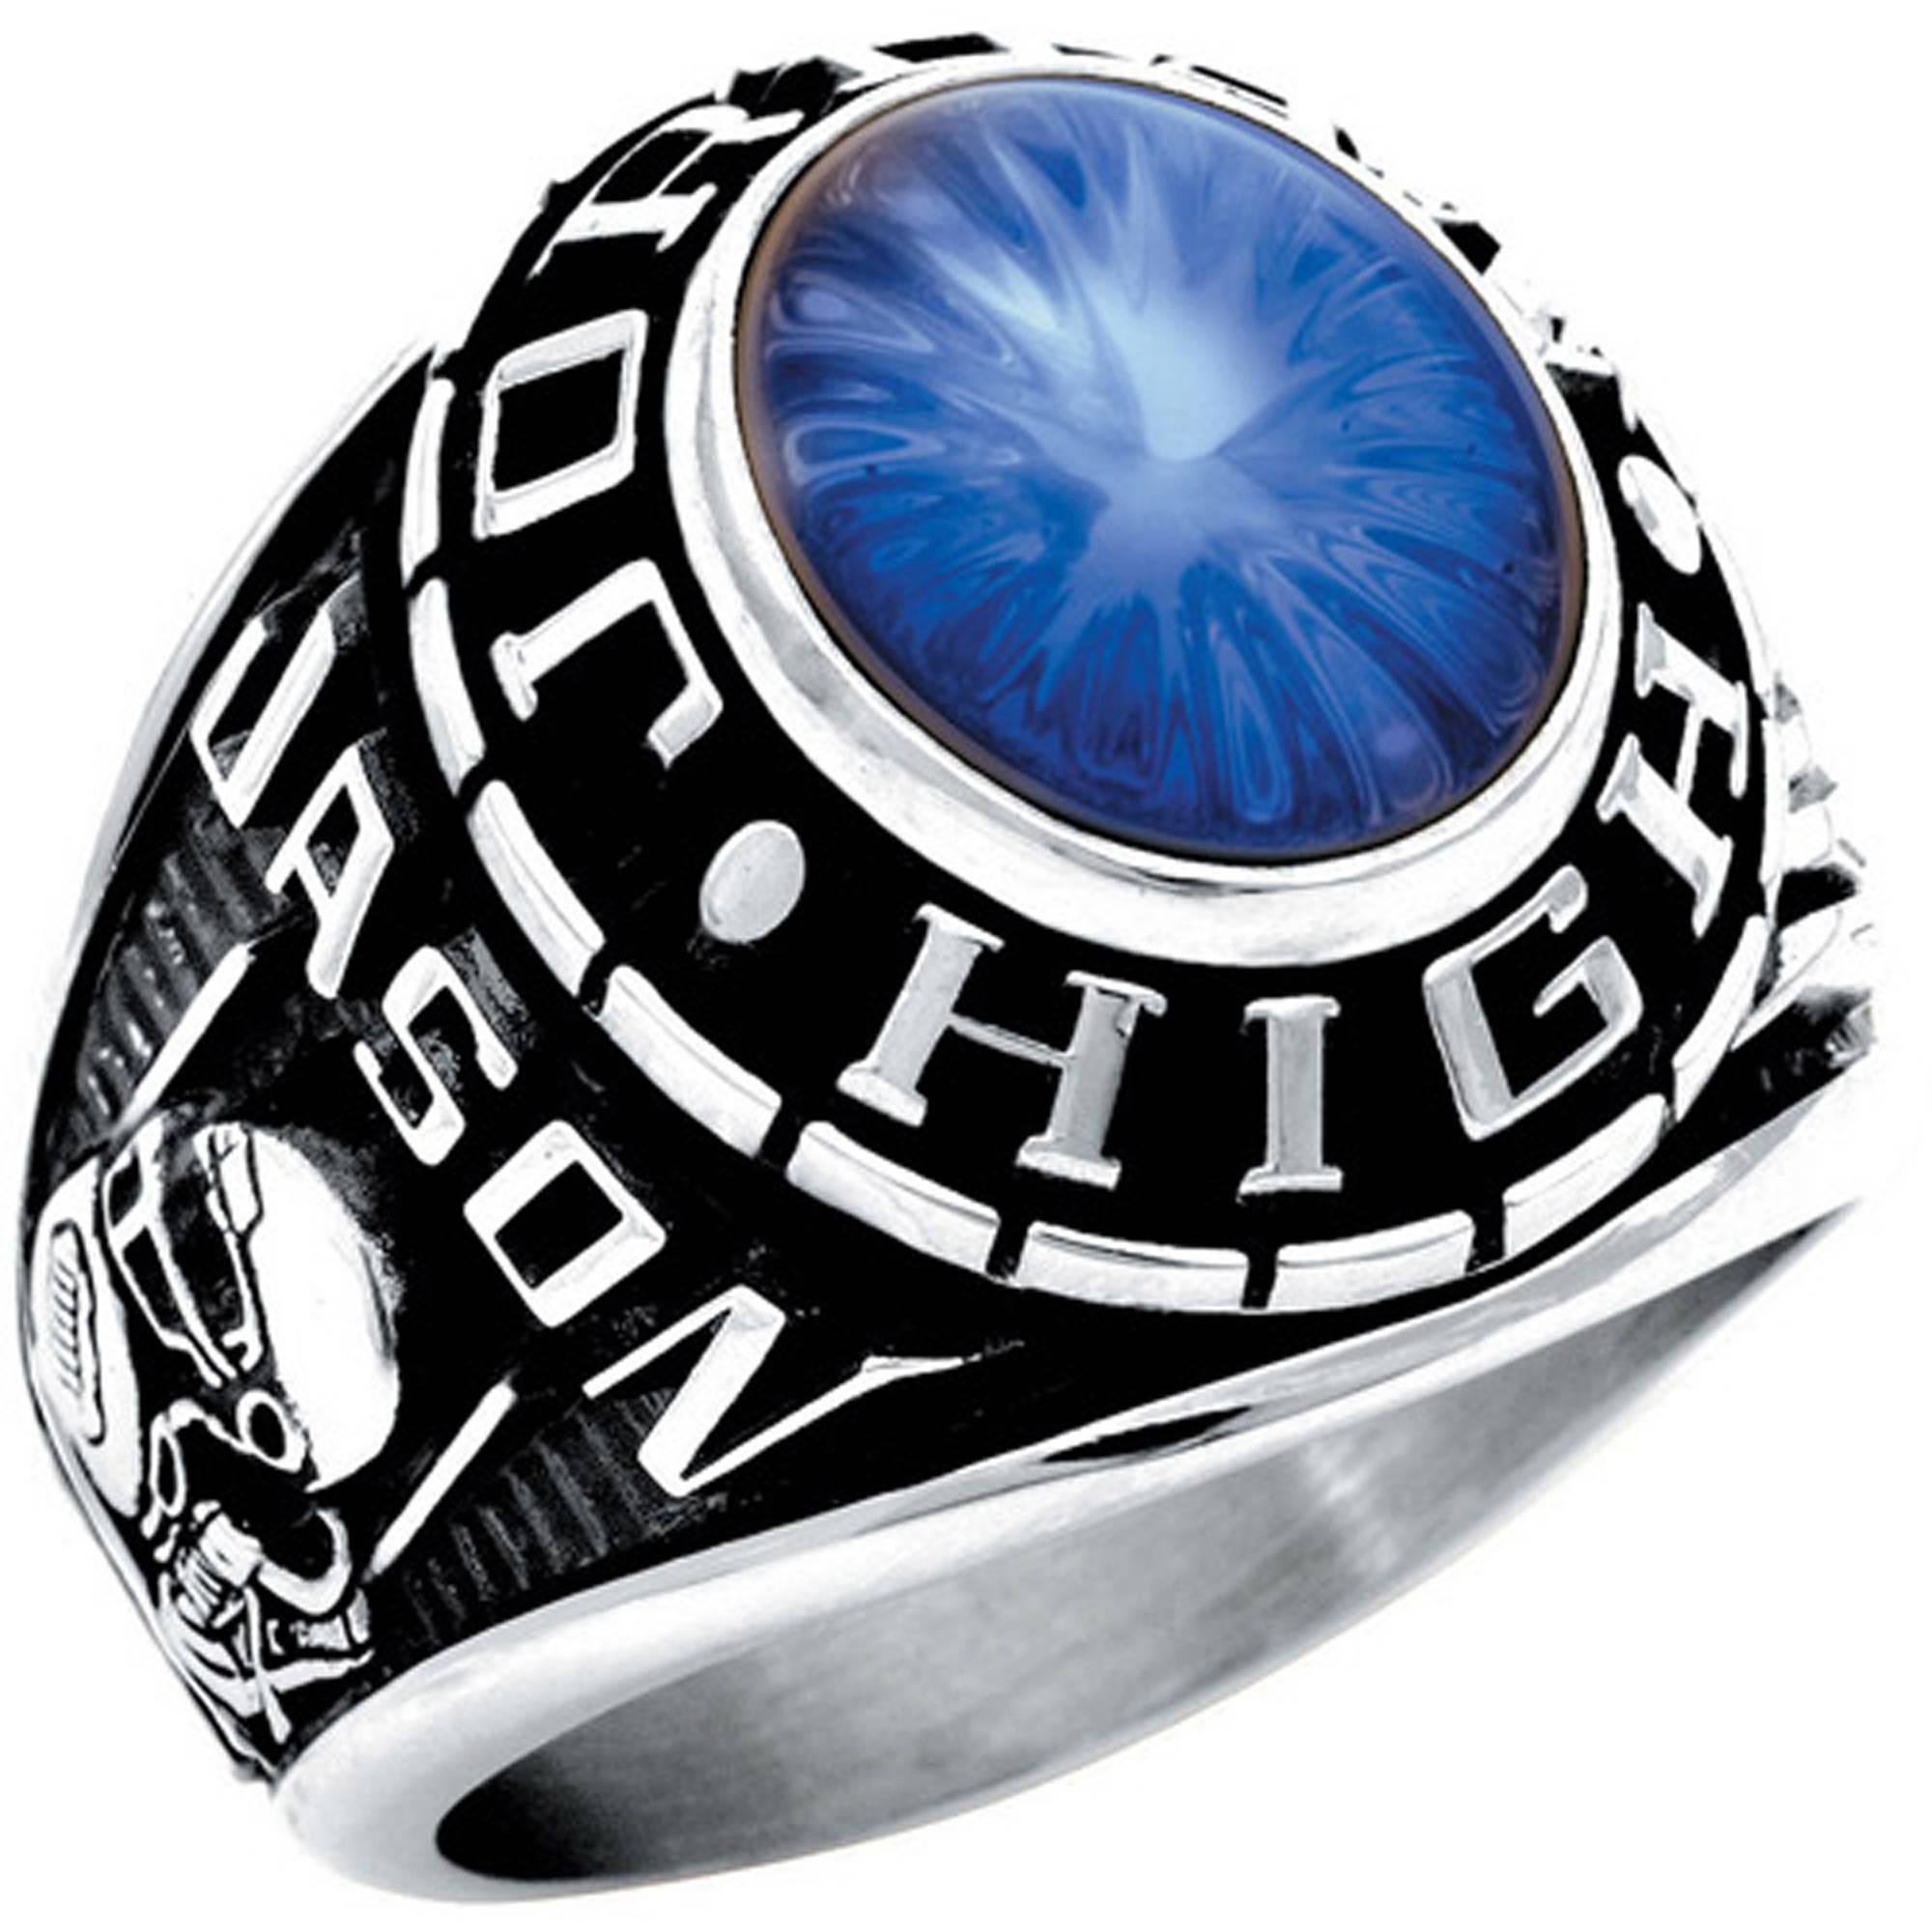 class rings keepsake guyu0027s oval class ring - walmart.com xojadsm